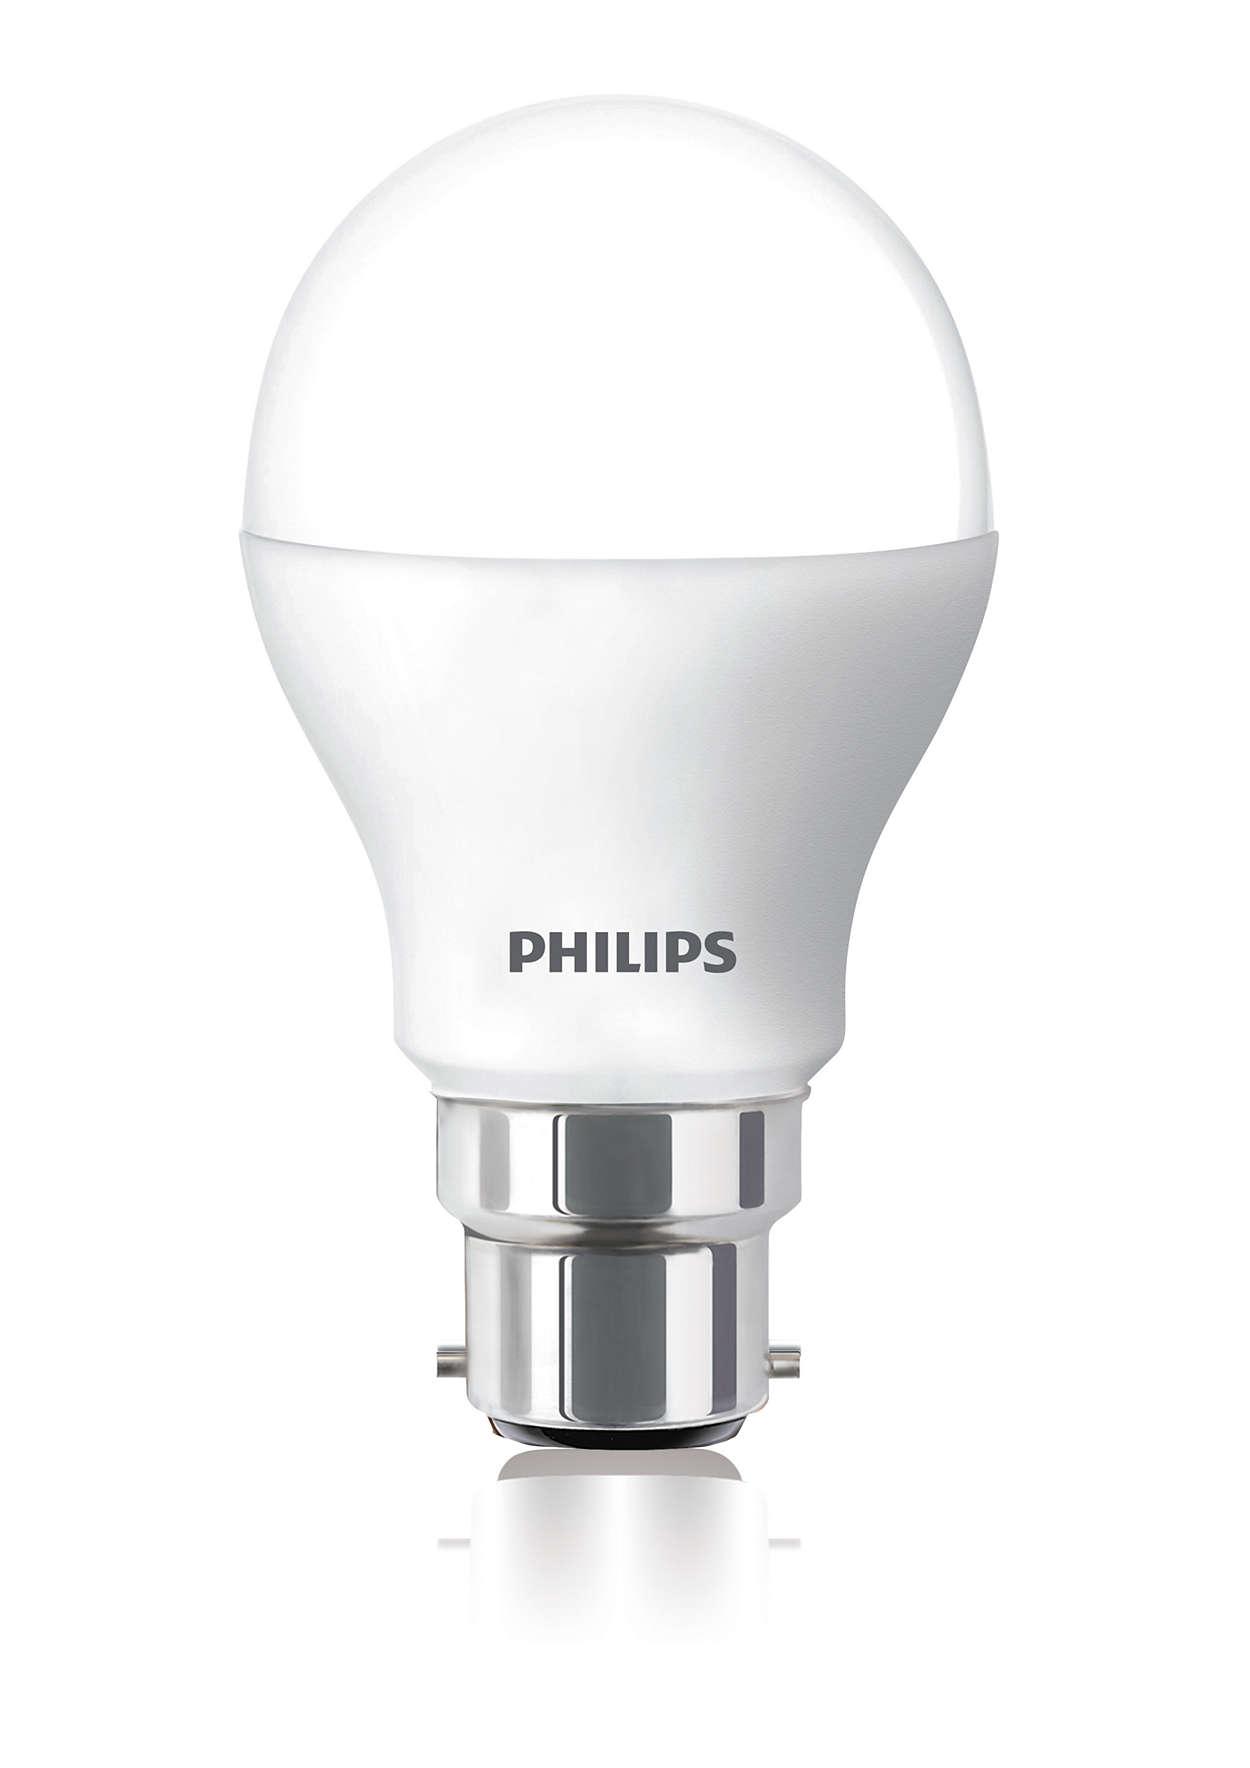 Download image PlusPng.com  - Bulb HD PNG